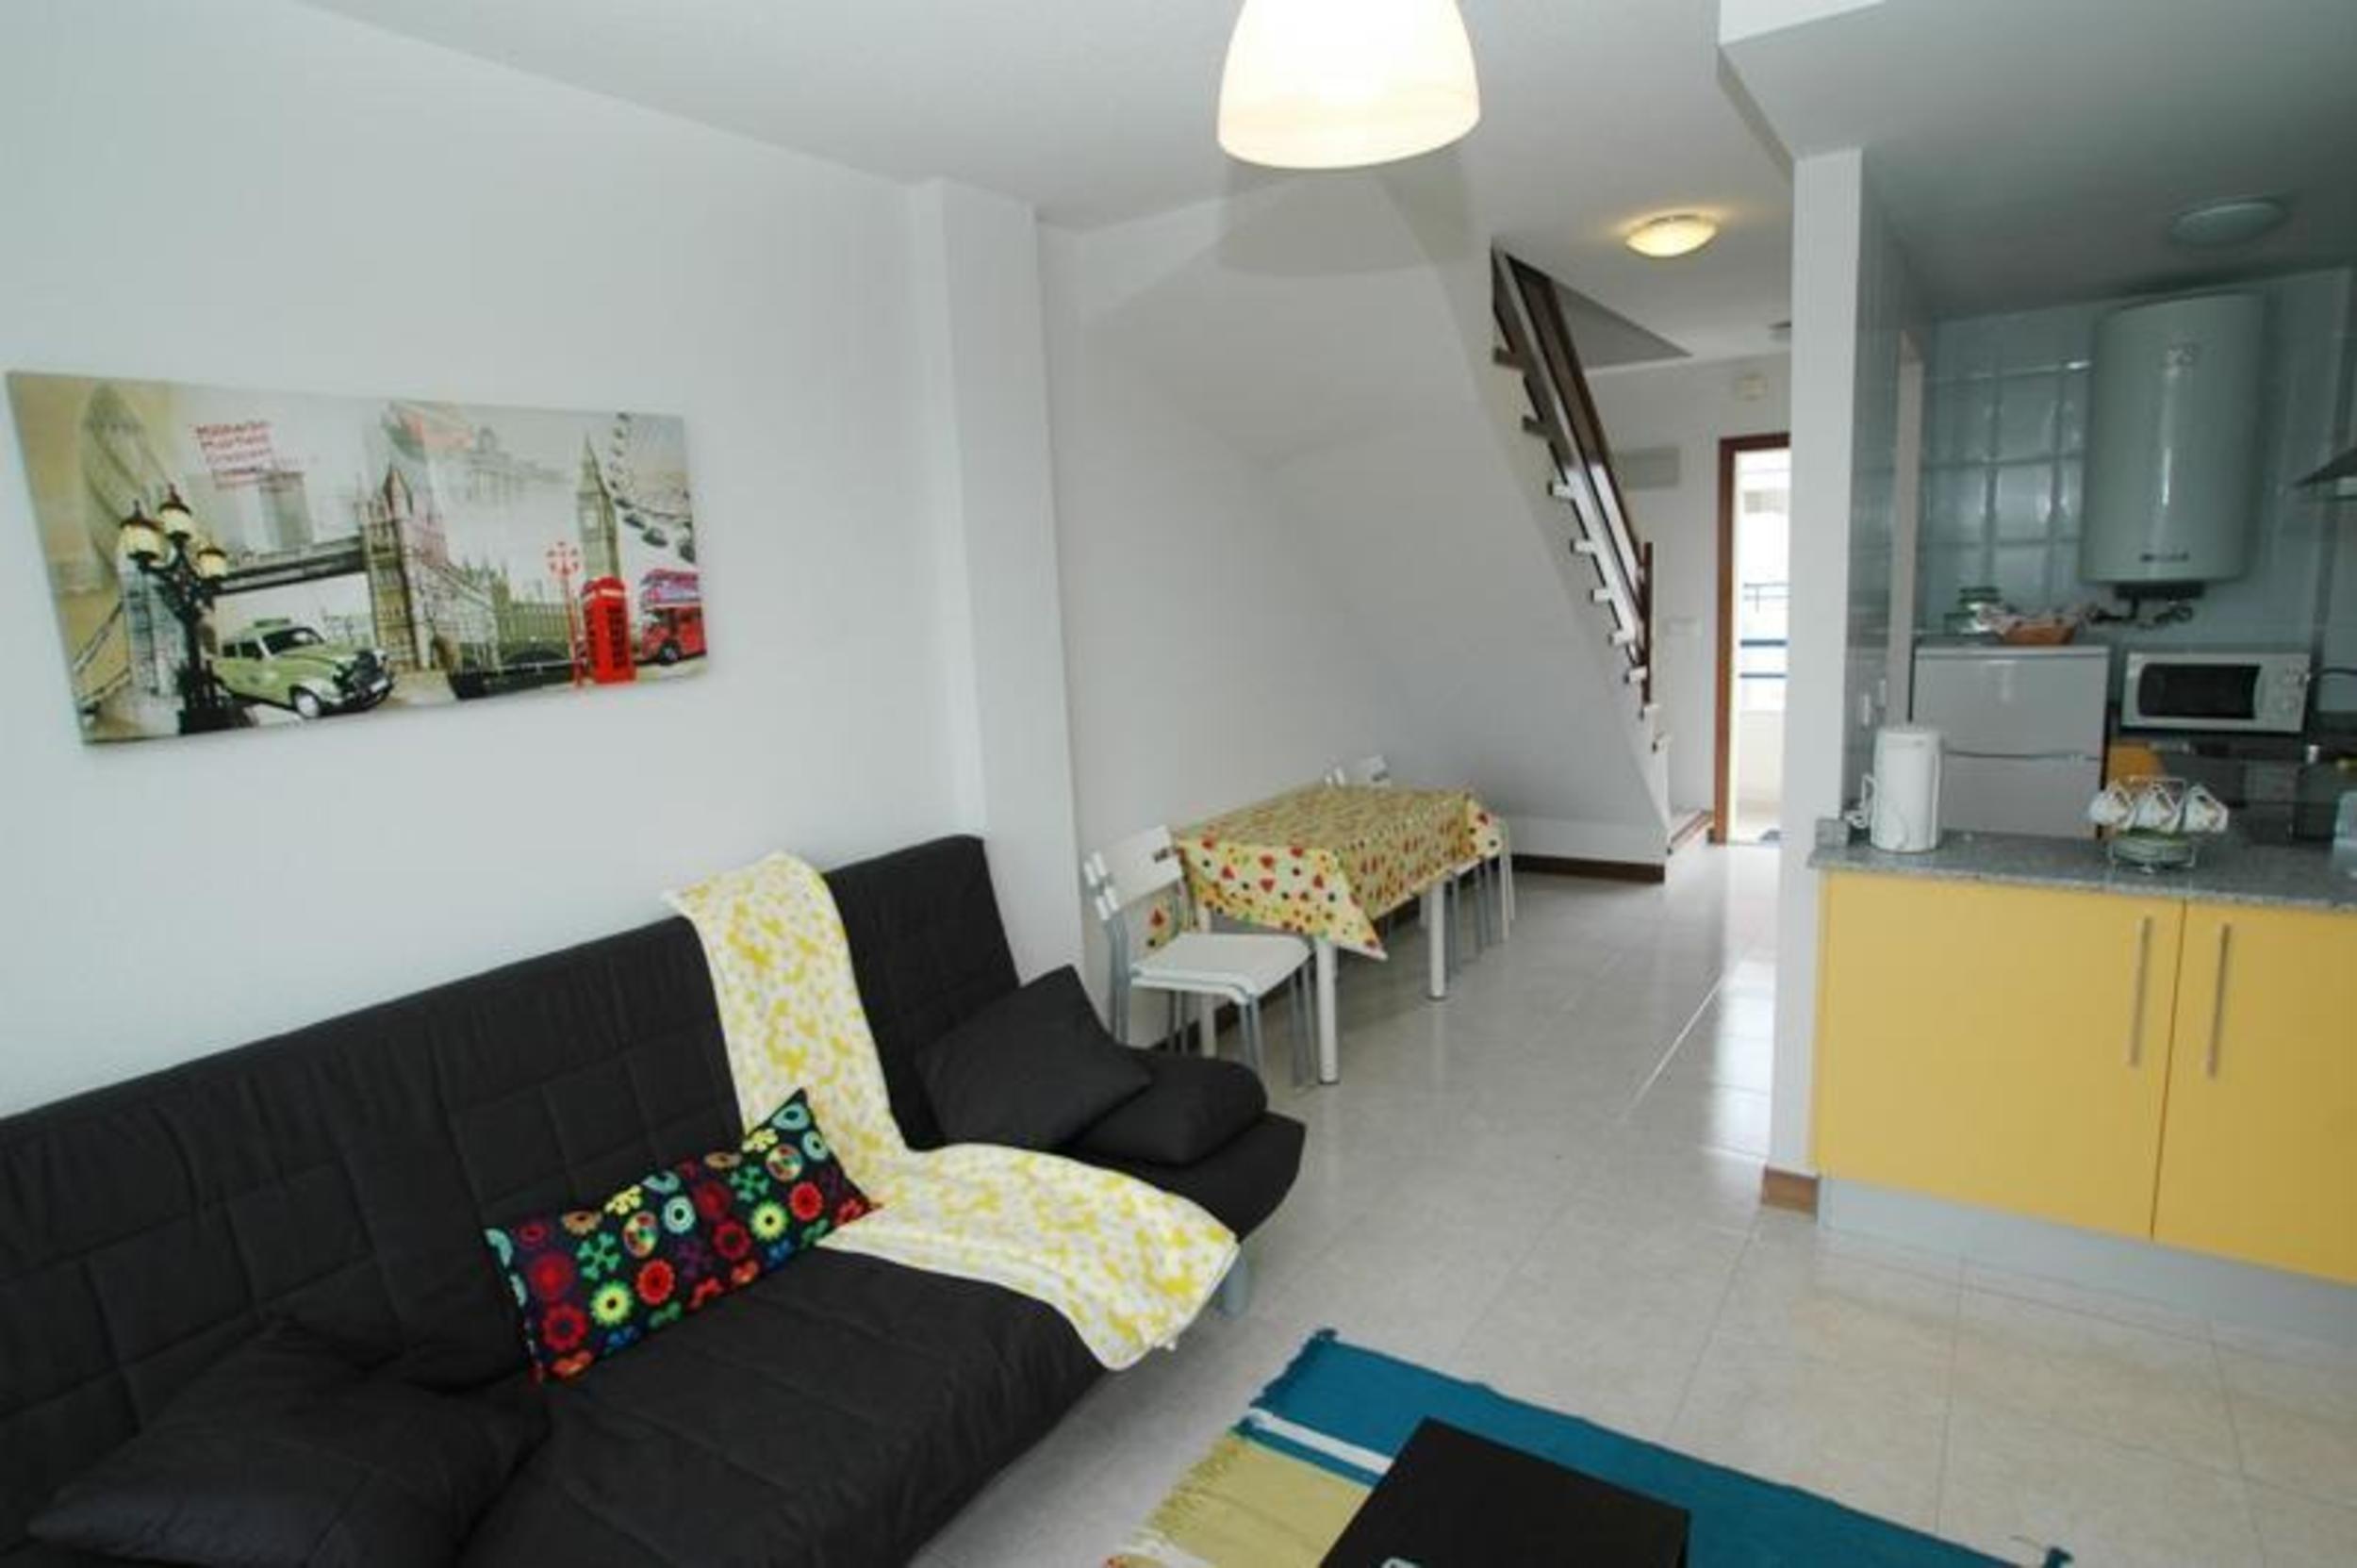 Ferienwohnung Apartment - 2 Bedrooms with Pool and Sea views - 102775 (2360880), Isla, Costa de Cantabria, Kantabrien, Spanien, Bild 10